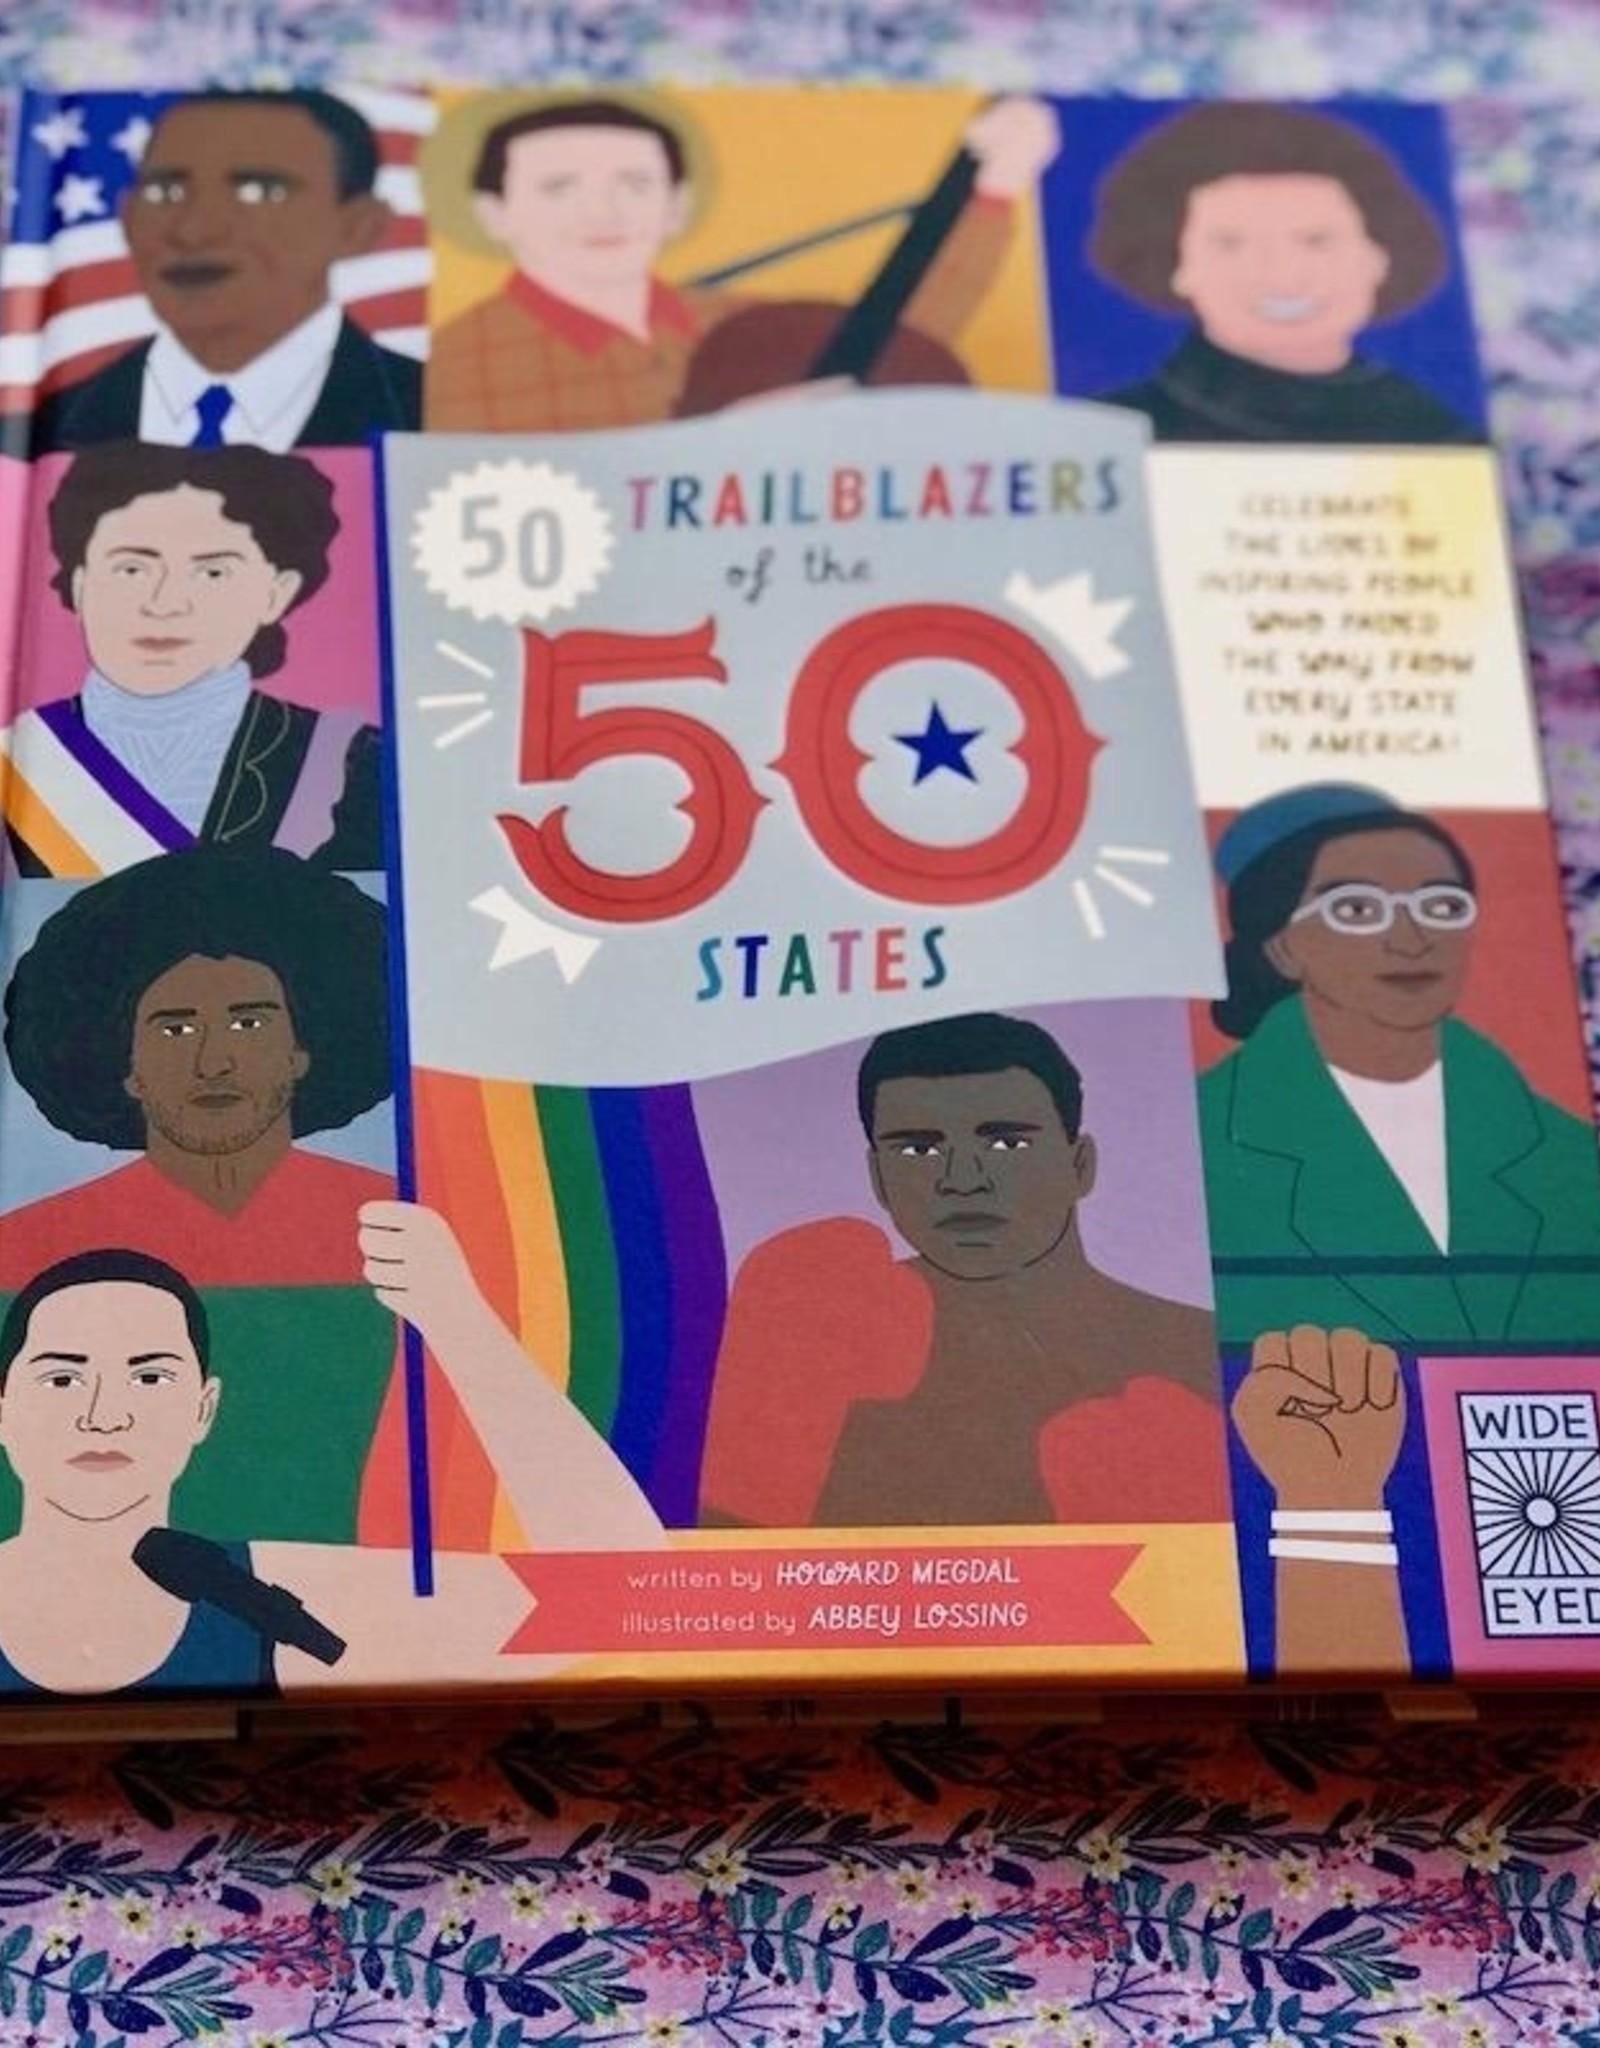 Quarto 50 Trailblazers of the 50 States